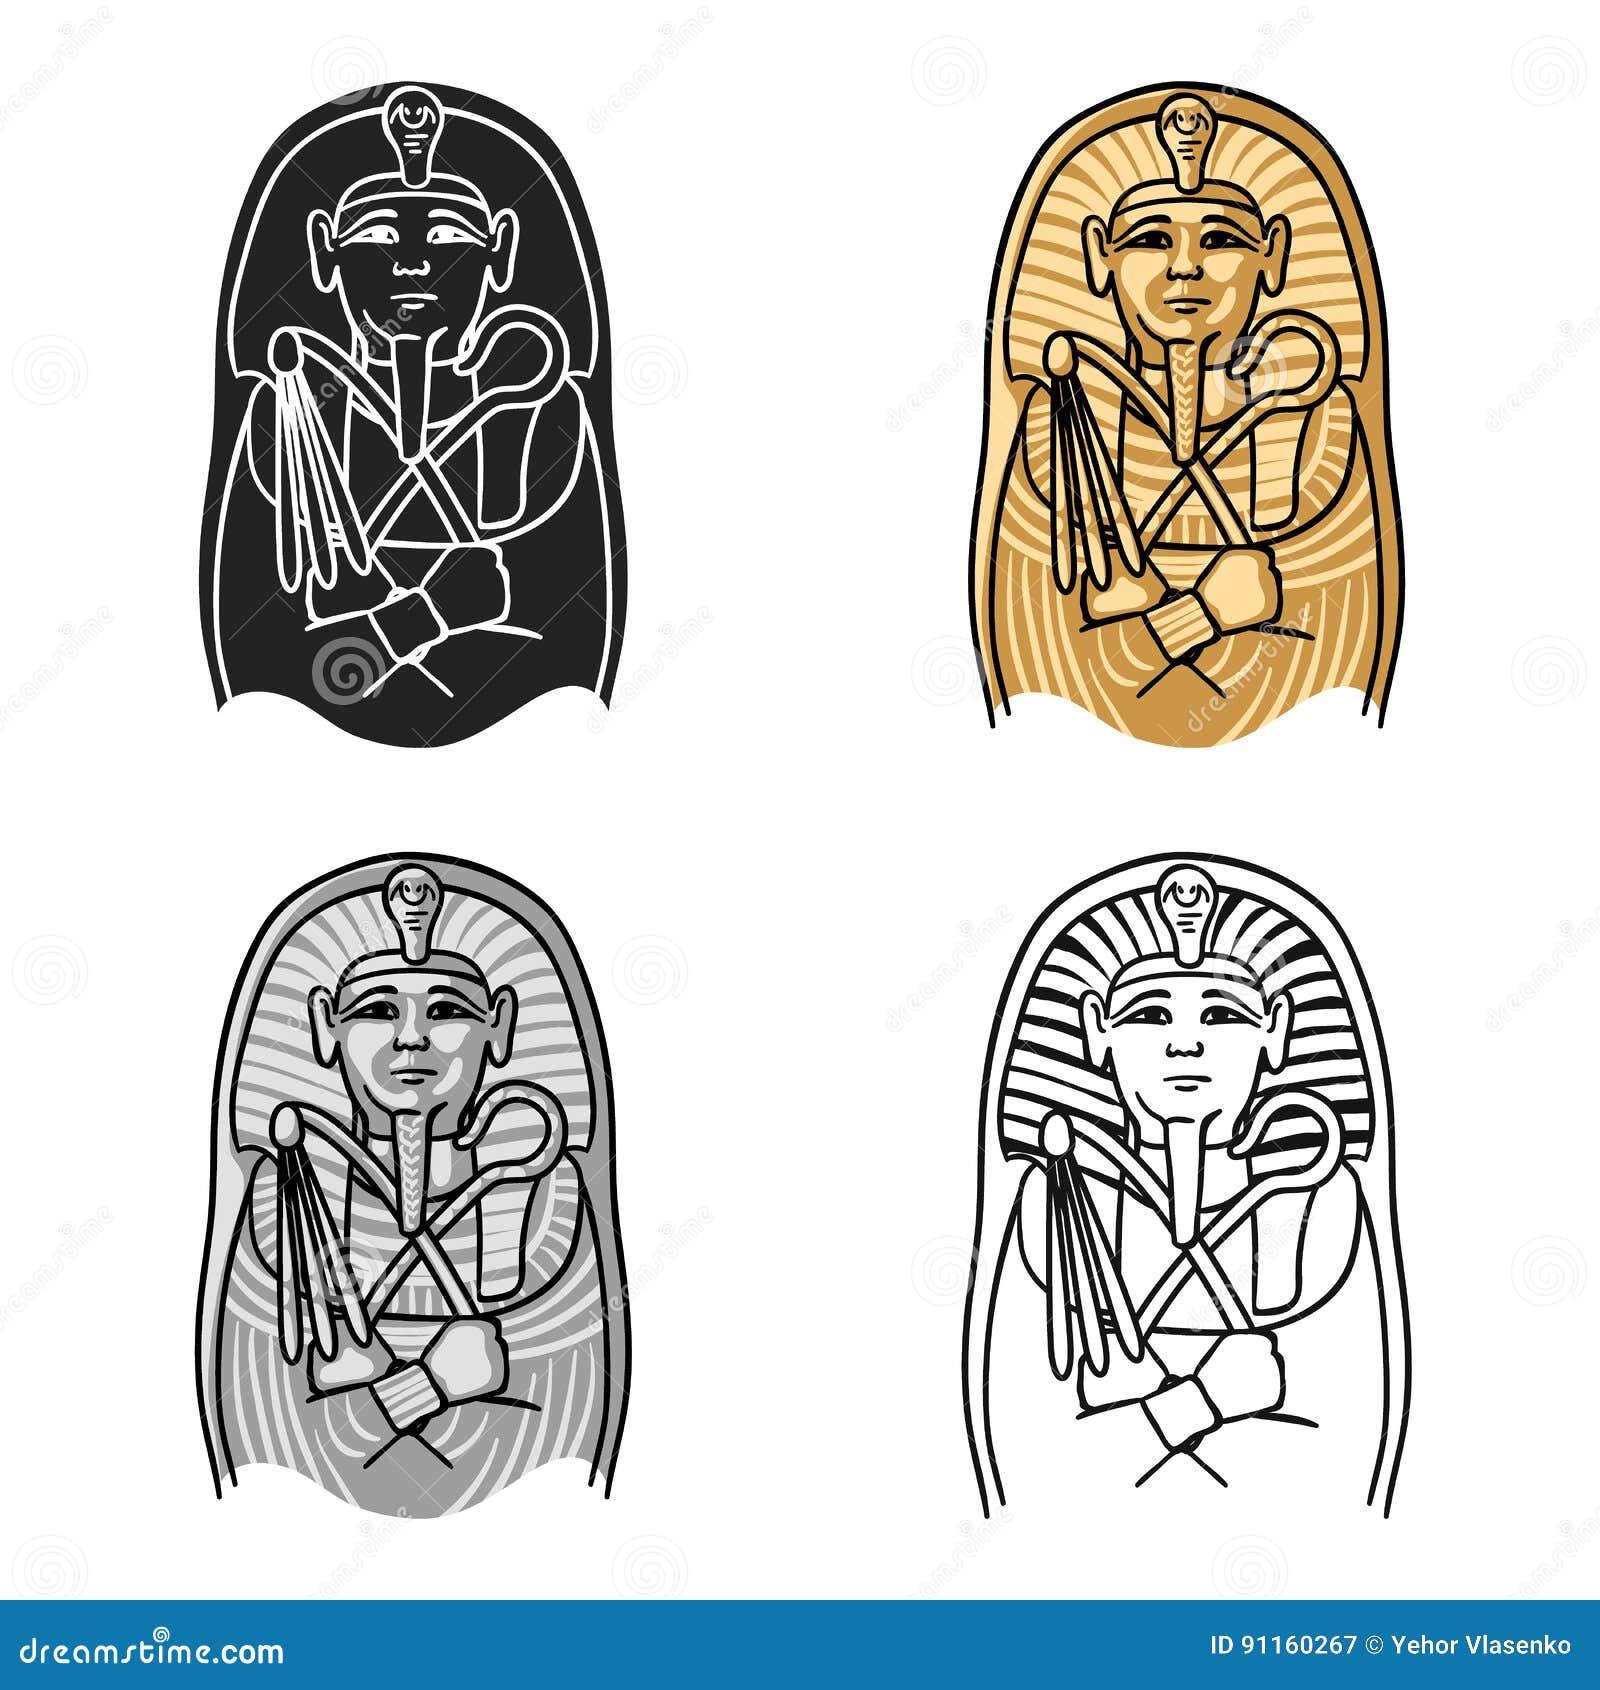 Icone Egipcio Do Sarcofago Do Farao No Estilo Dos Desenhos